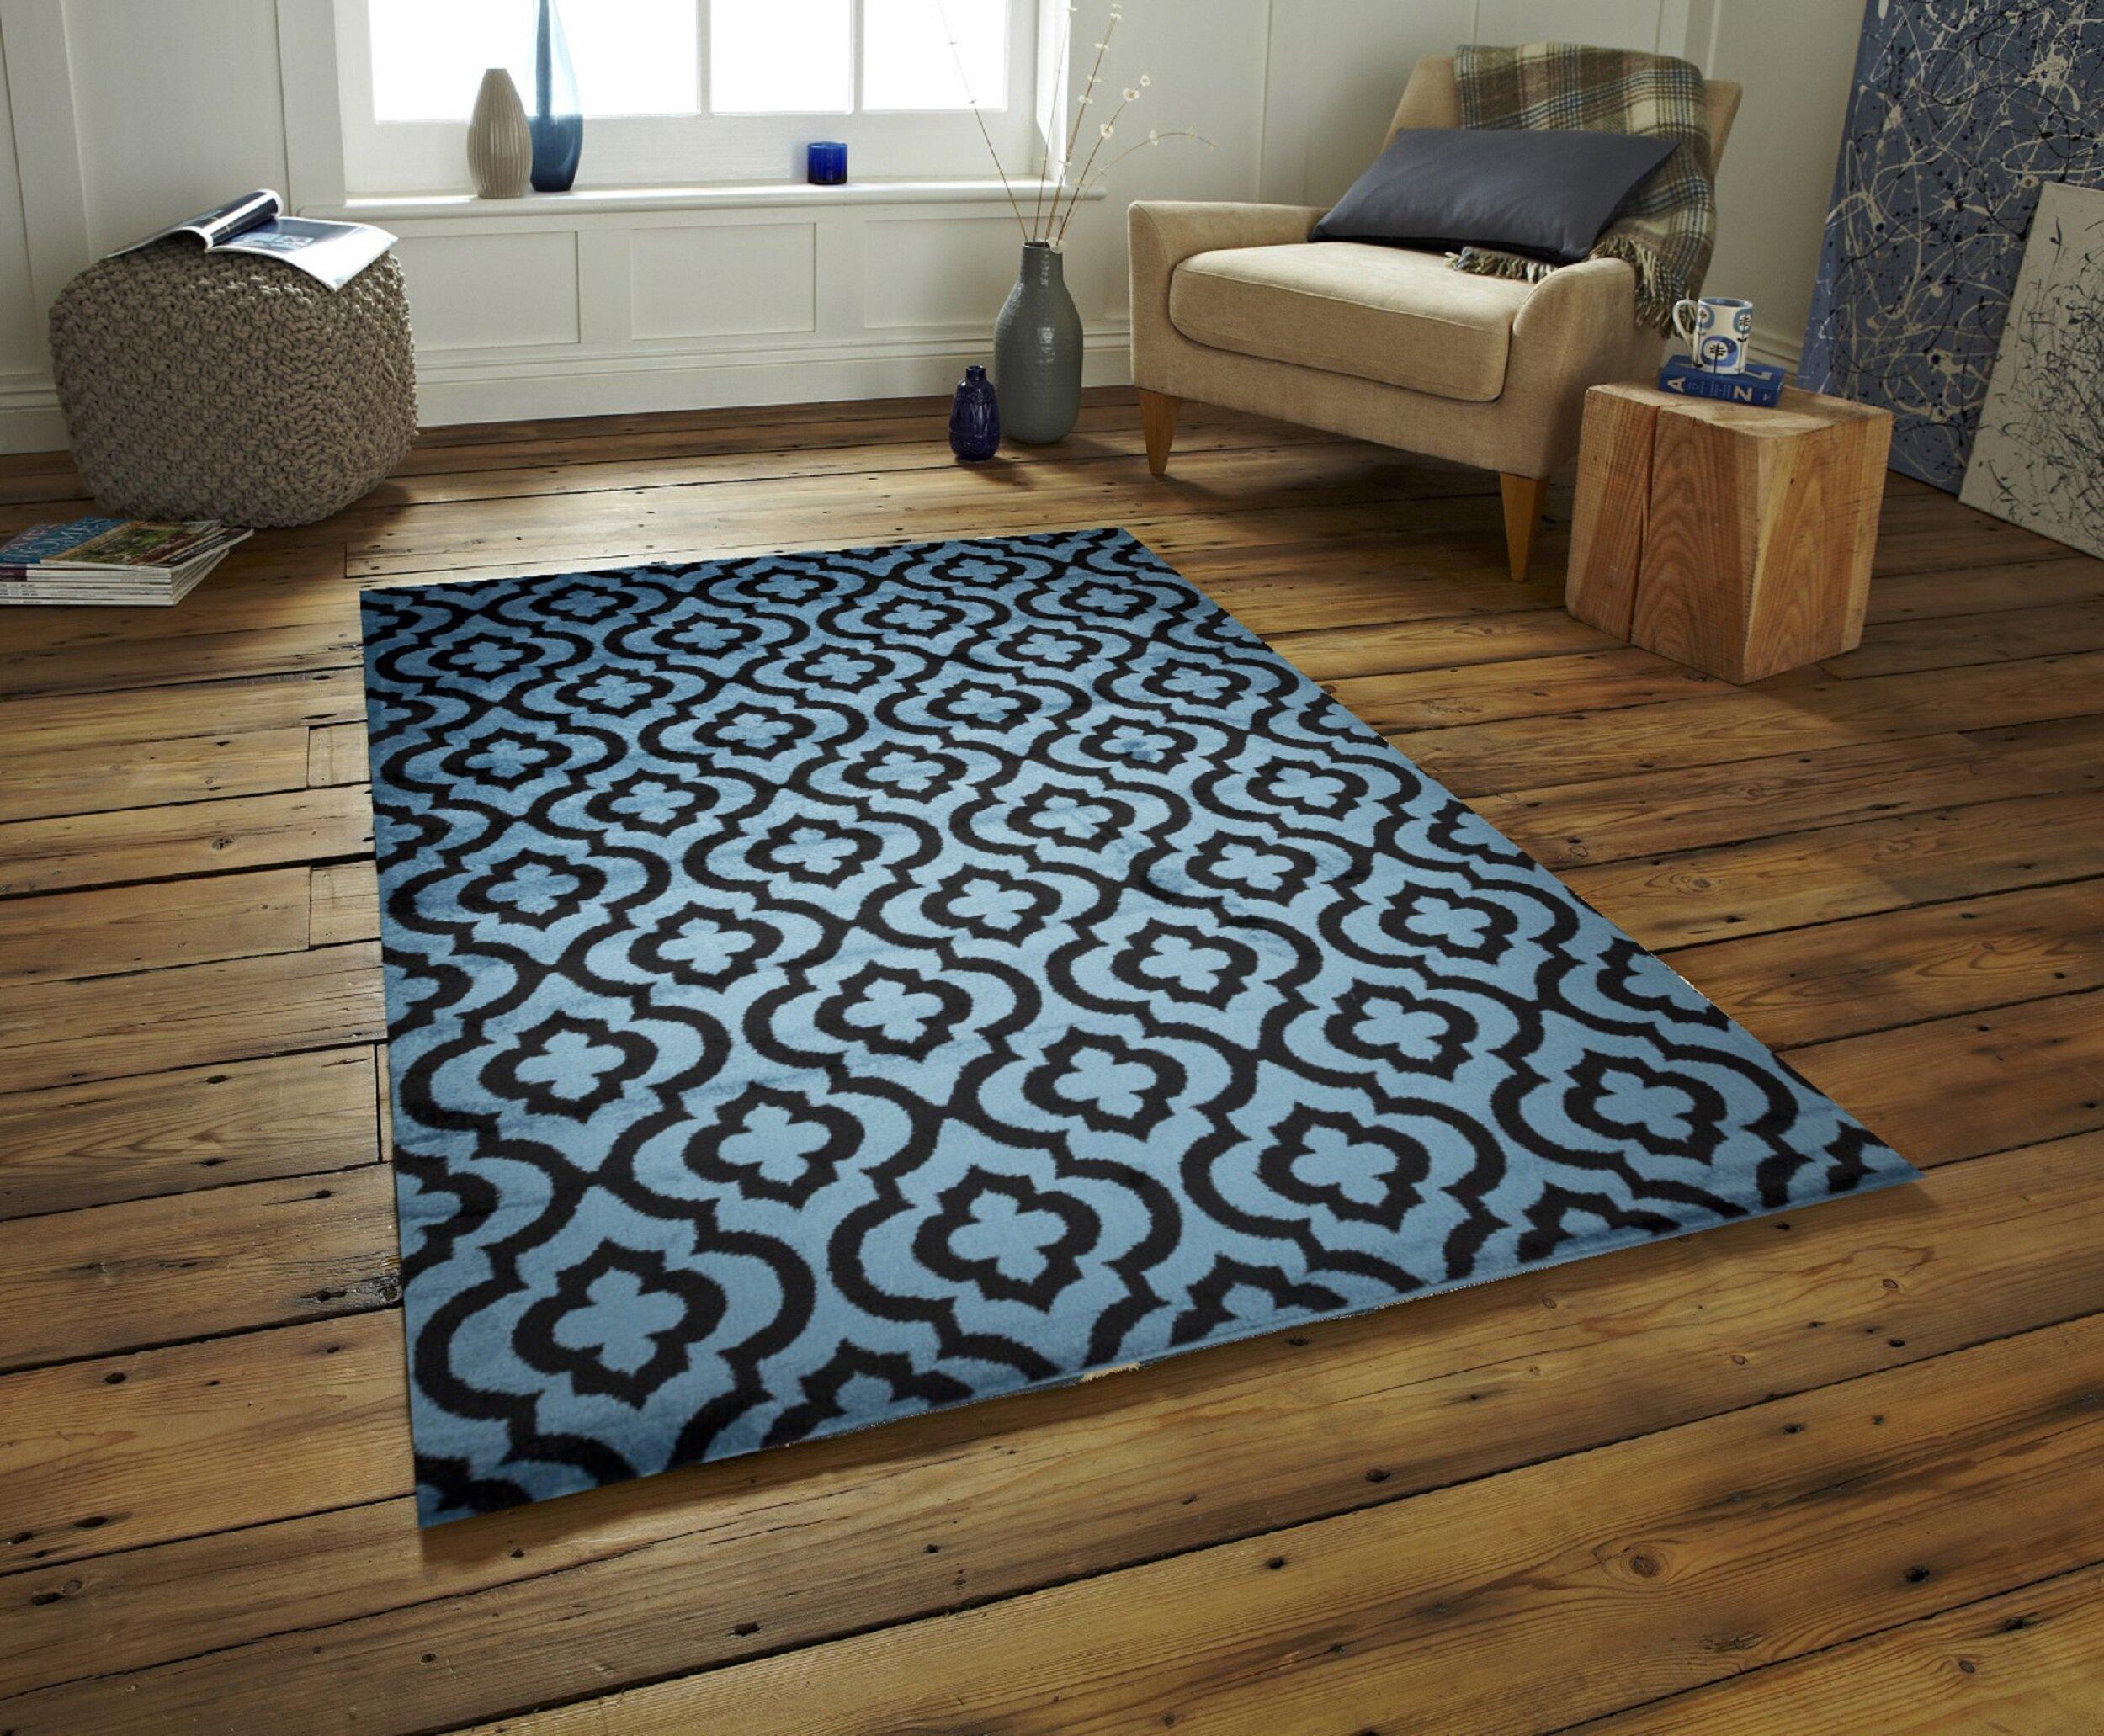 Charlton Home Selway Mirror Rehash Black Blue Area Rug Reviews Wayfair